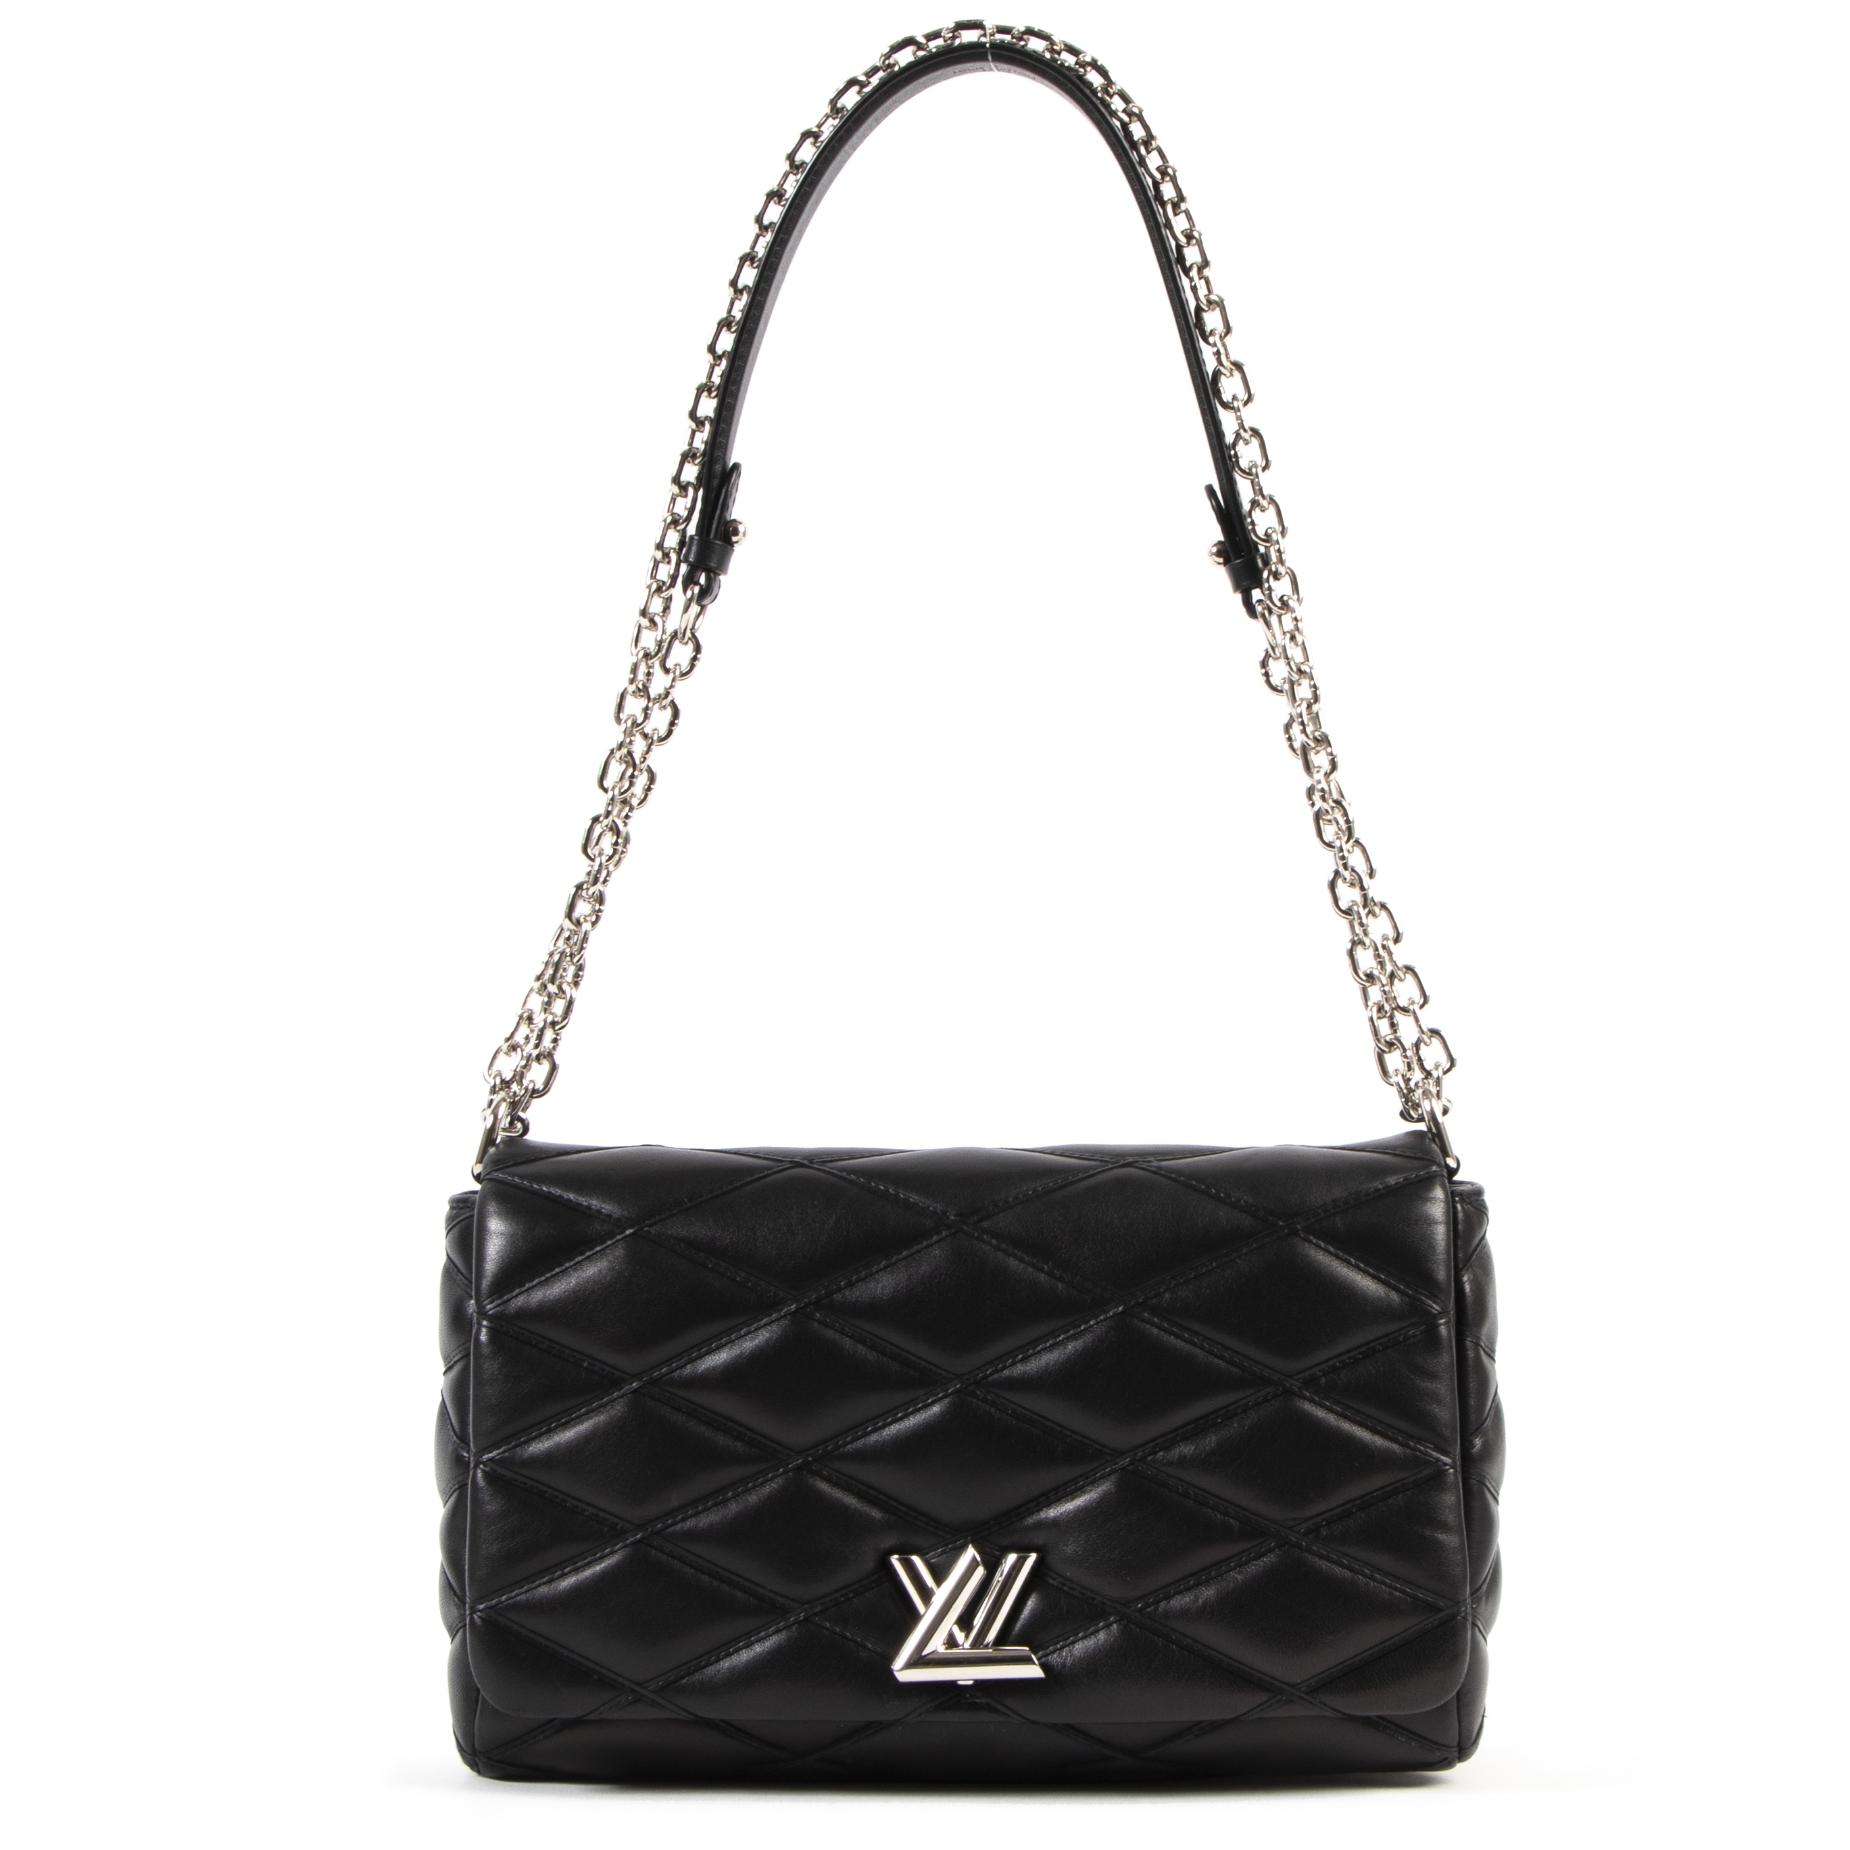 Louis Vuitton GO-14 Malletage Lambskin Leather MM Shoulder Bag